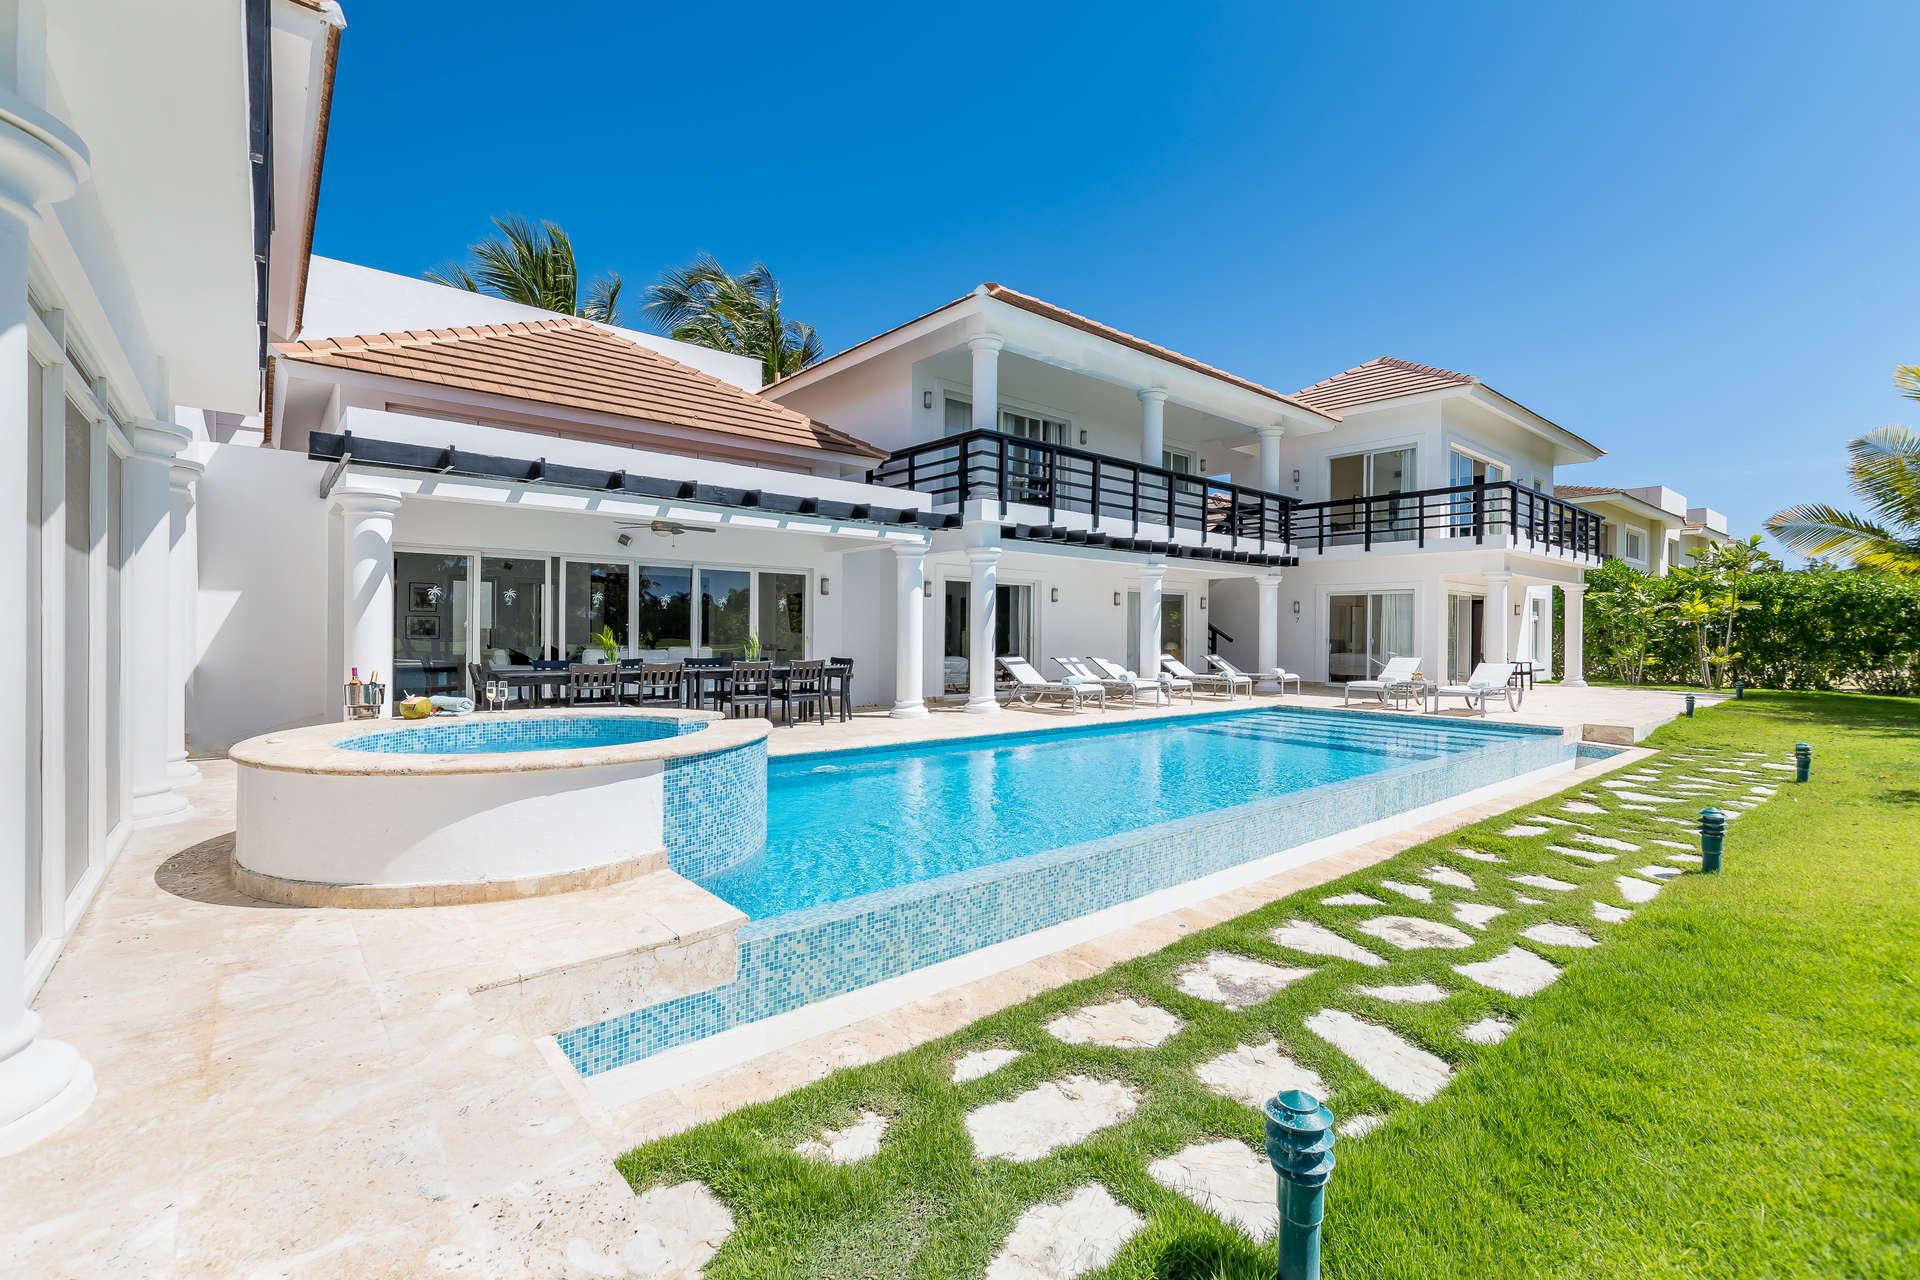 Luxury villa rentals caribbean - Dominican republic - Punta cana - Bavaro - Lake View Villa - Image 1/33